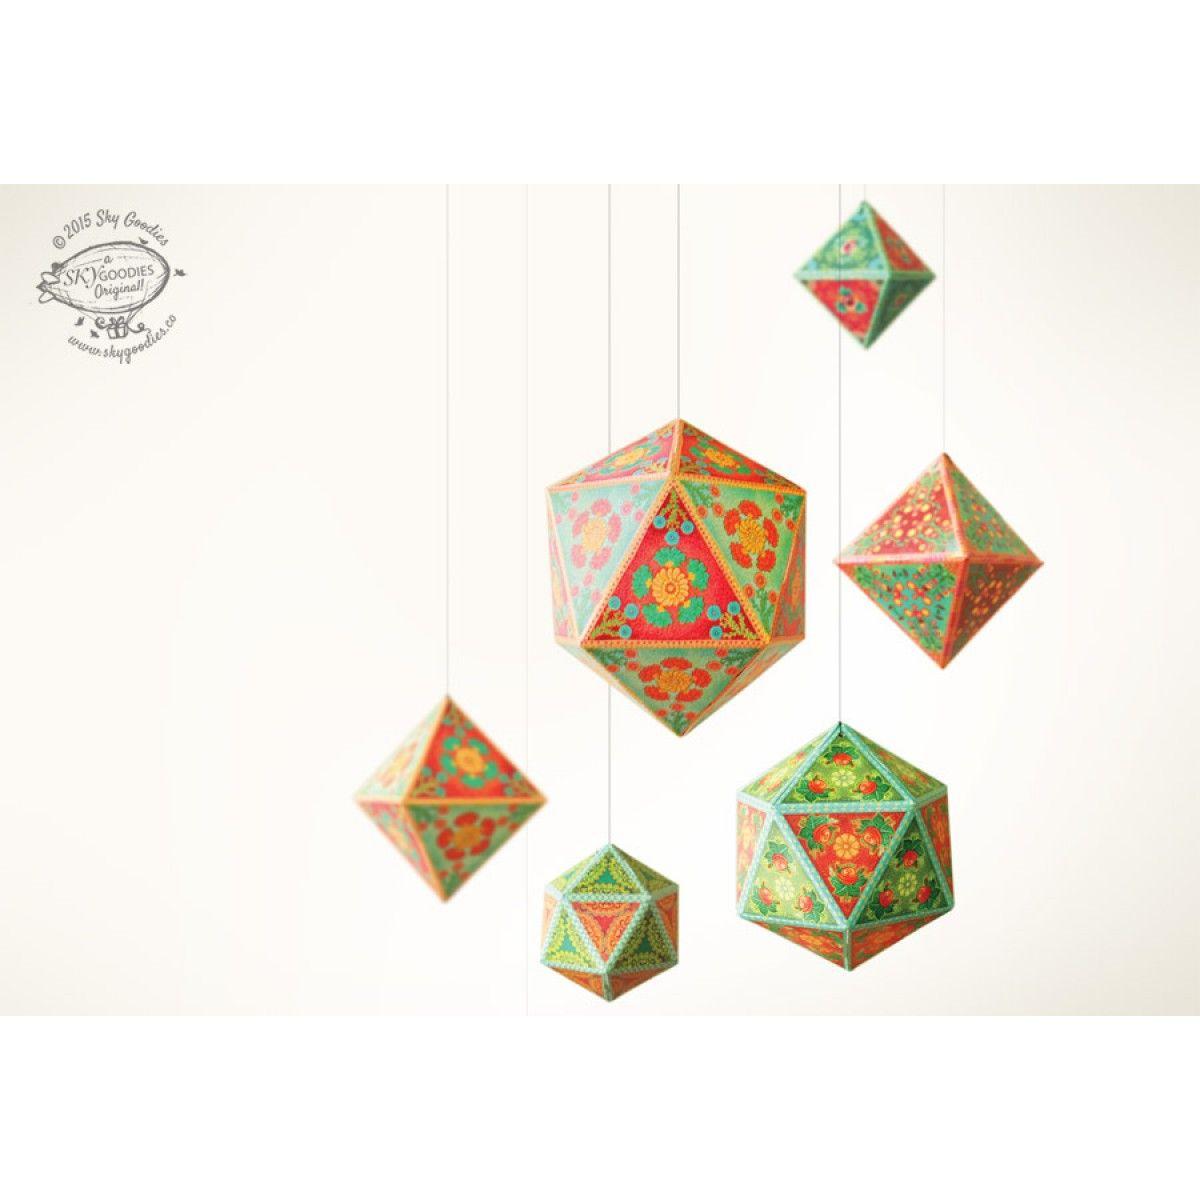 festi_-_diy_festive_ornaments_set_of_10_1